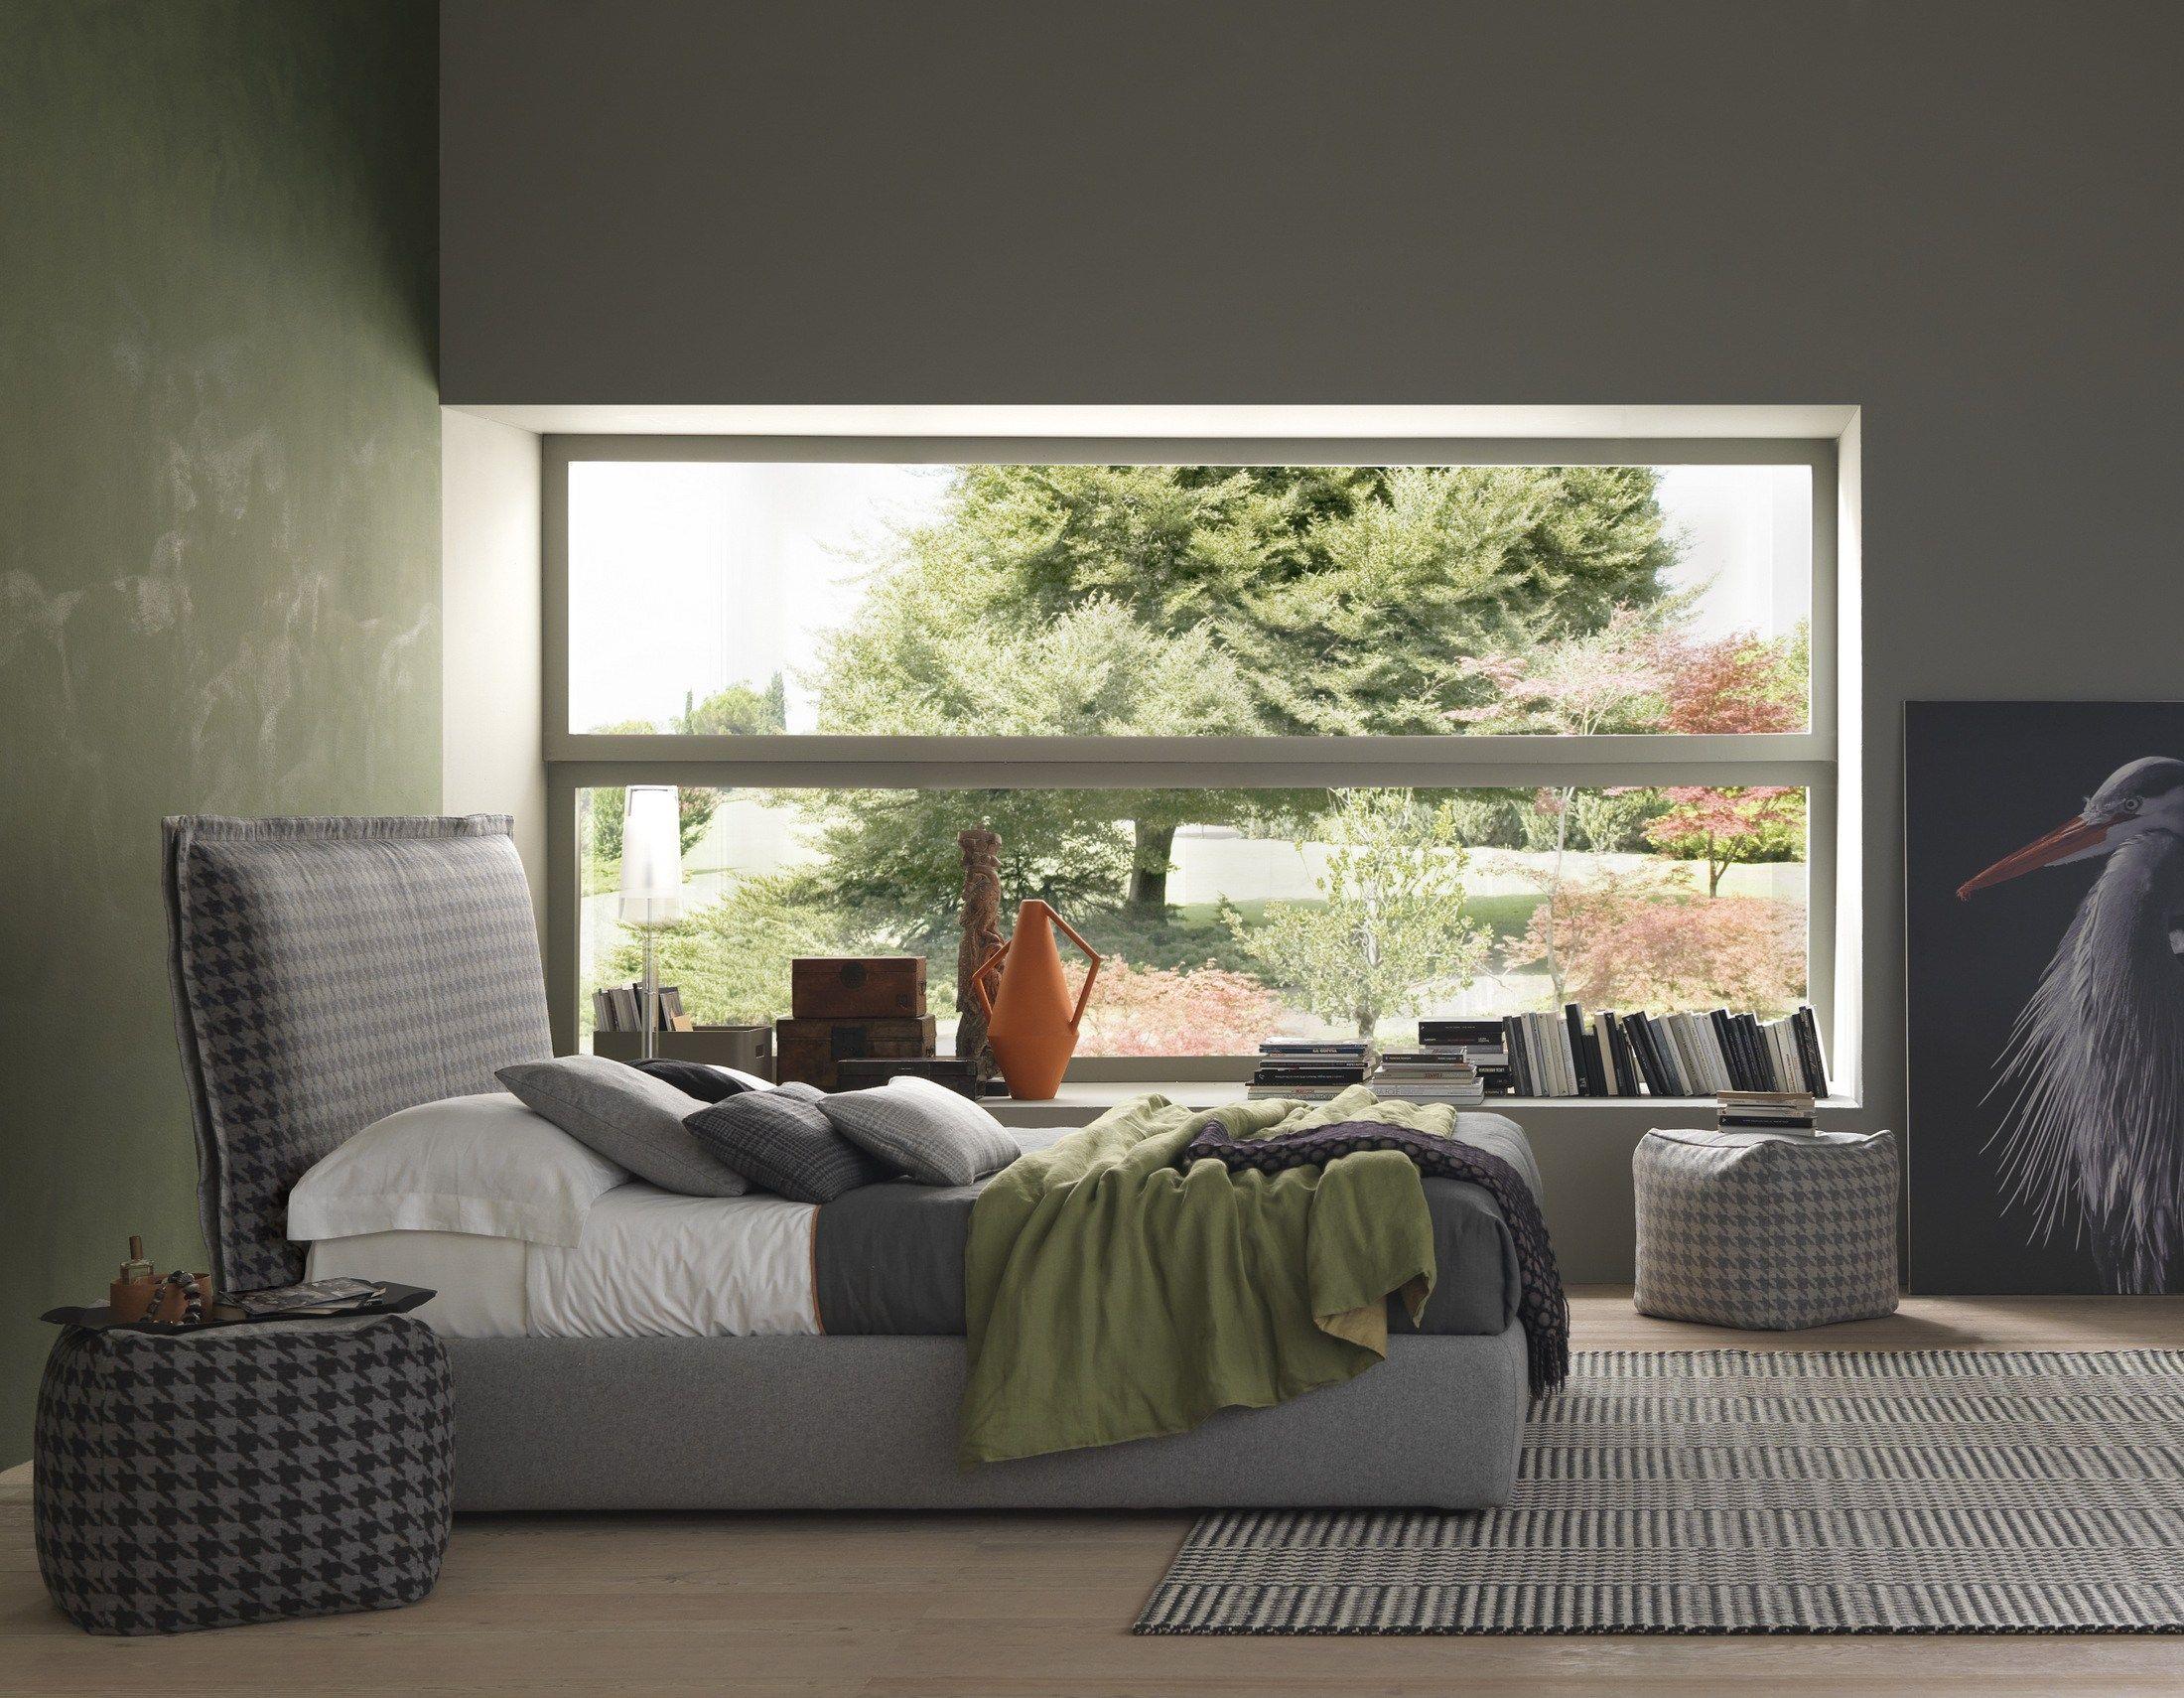 Best 25 Rustic grey bedroom ideas on Pinterest  White